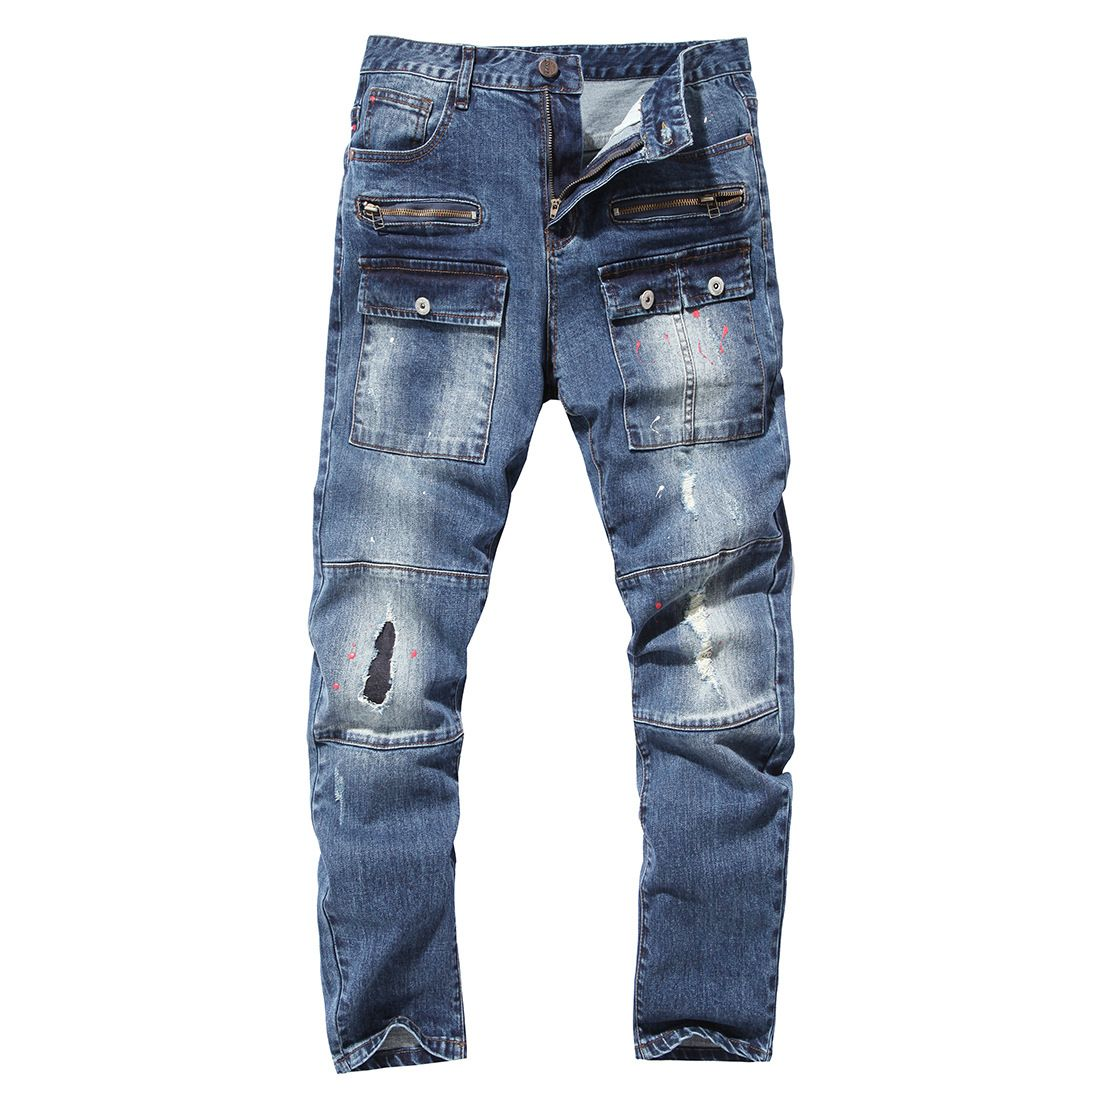 2018 Mens Leg With Hole Straight Slim Biker Denim Jeans Trousers Skinny Pants